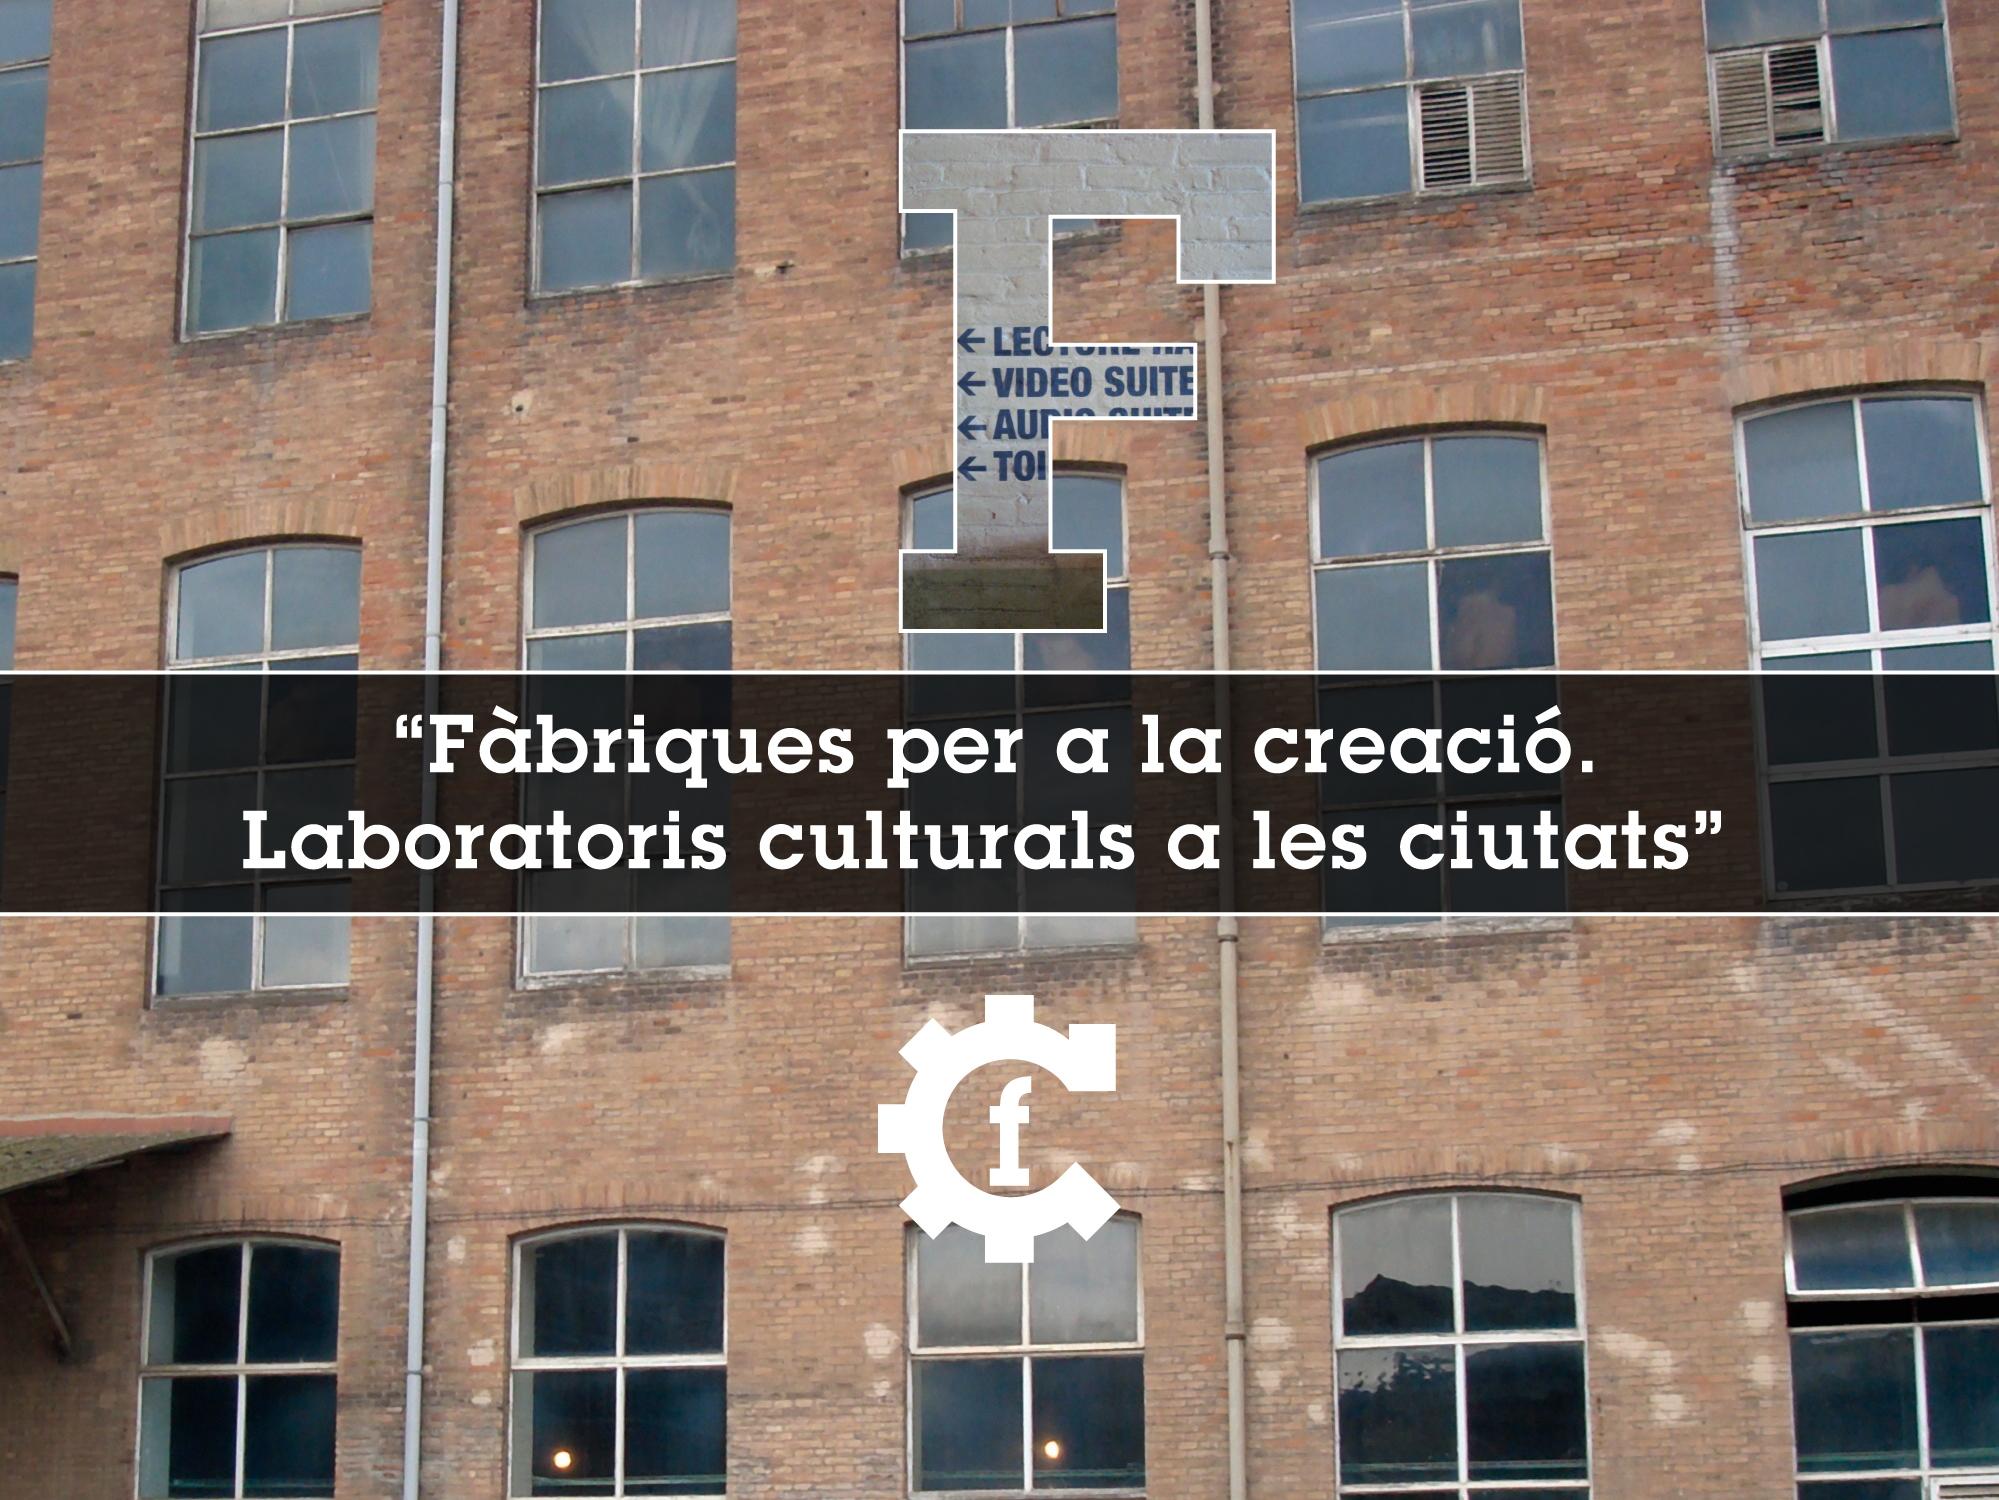 pacoiglesias_bcncultura_fabriques_creacio-01